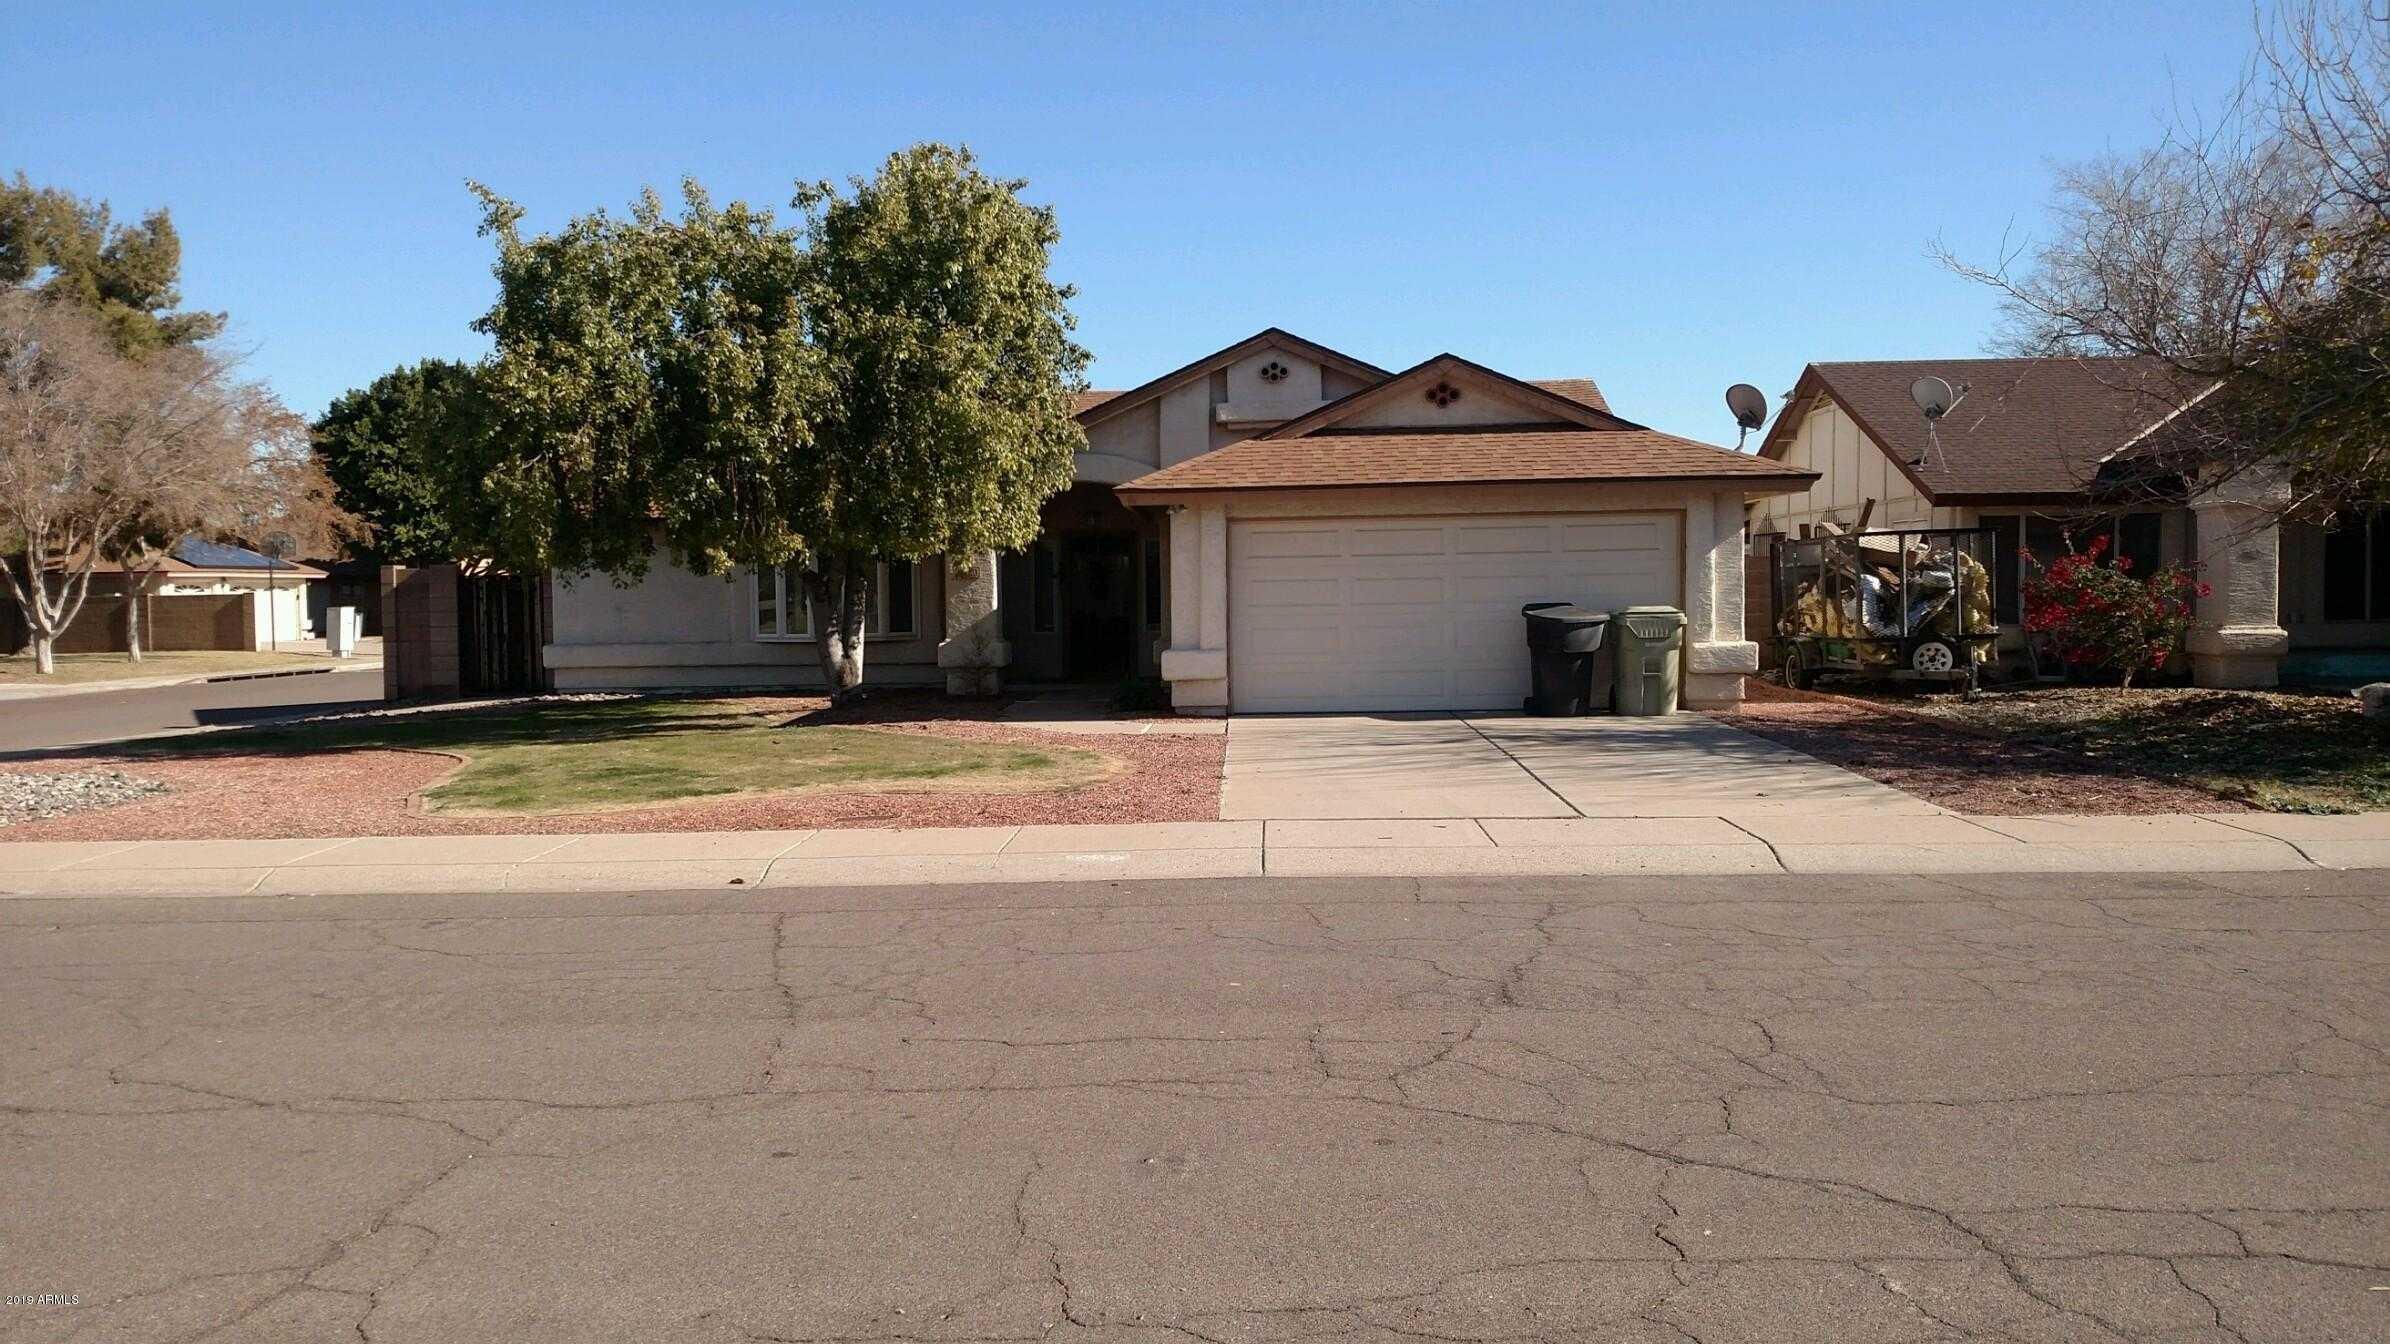 $219,000 - 3Br/2Ba - Home for Sale in Camelback Park Lot 1-288 Tr A-d, Glendale